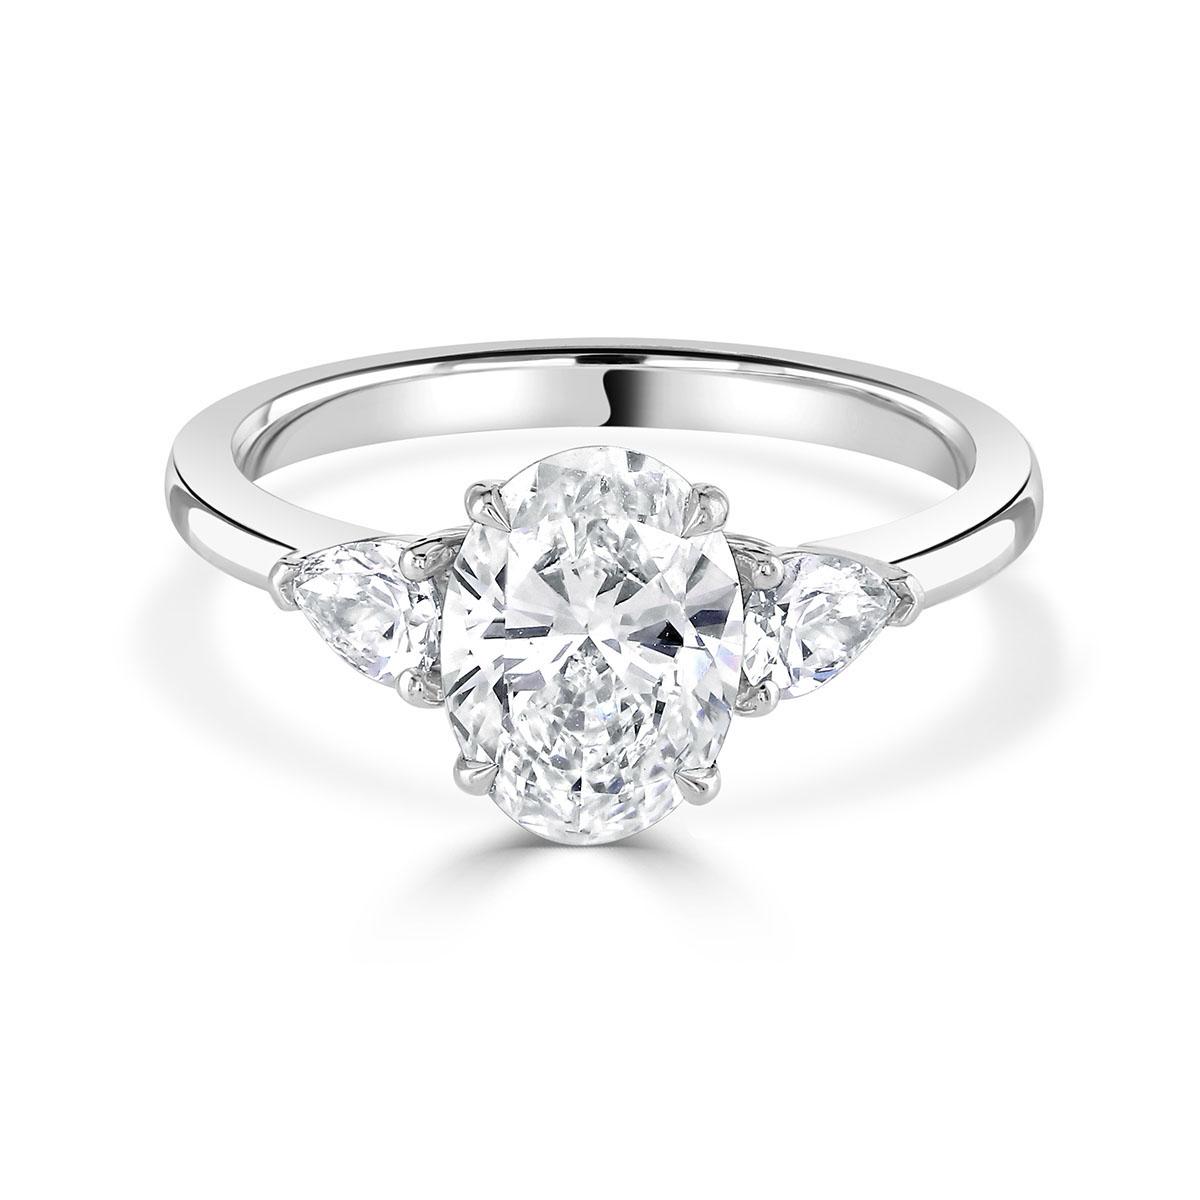 Oval Cut Platinum Trilogy Ring